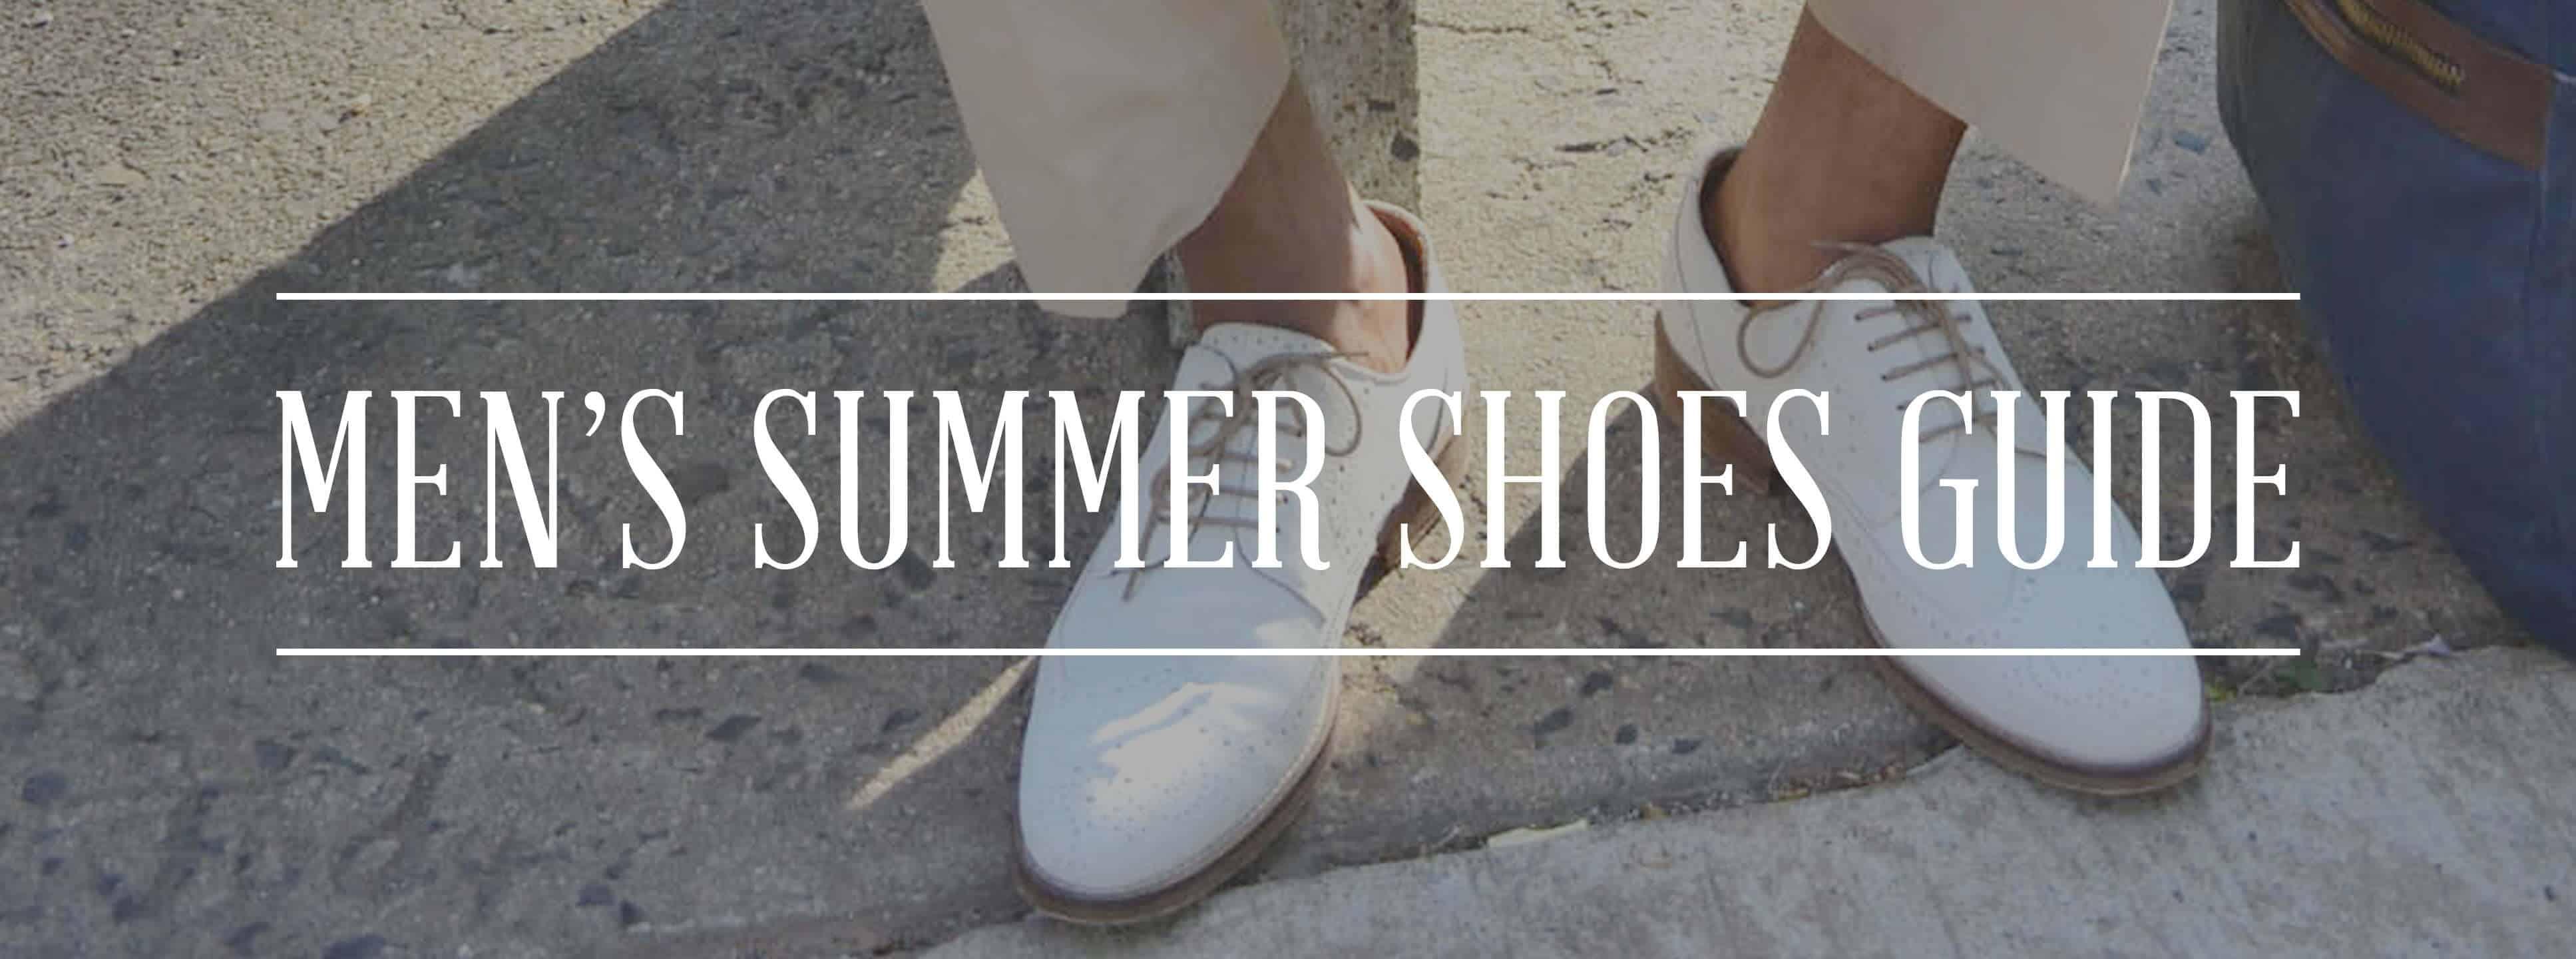 8b637e4b0ec Men's Summer Shoes Guide — Gentleman's Gazette